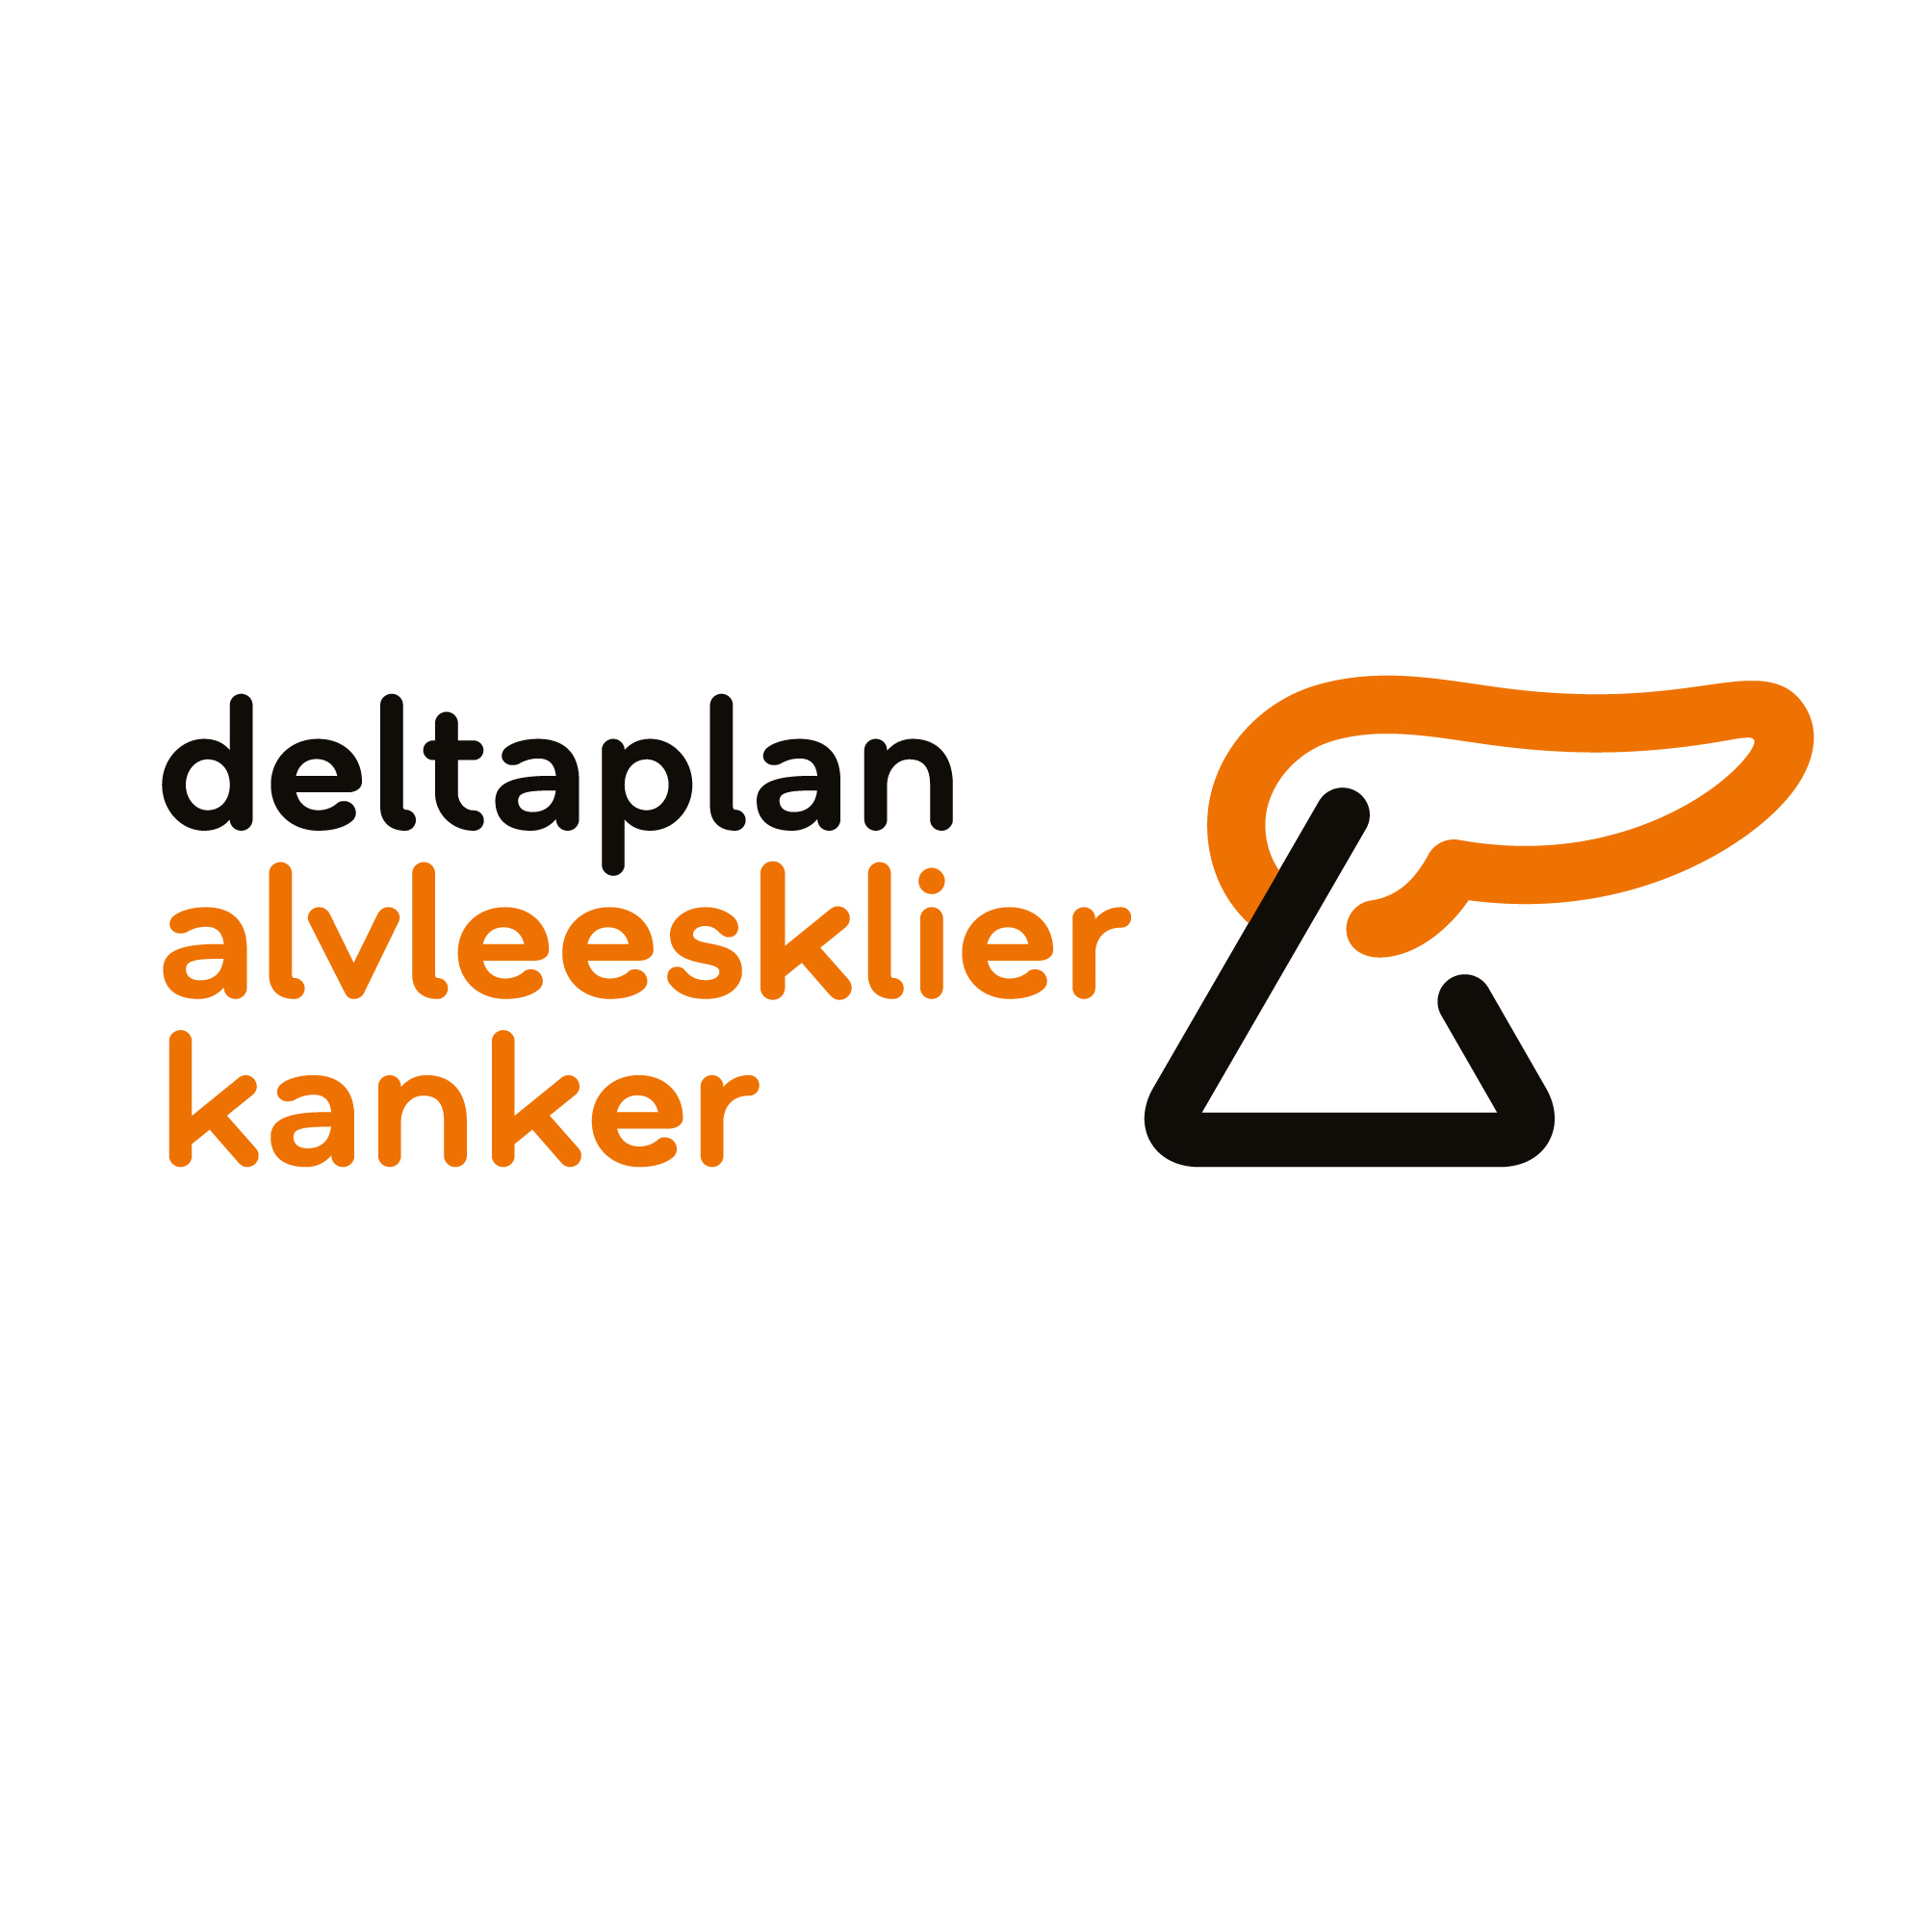 Deltaplan Alvleesklierkanker